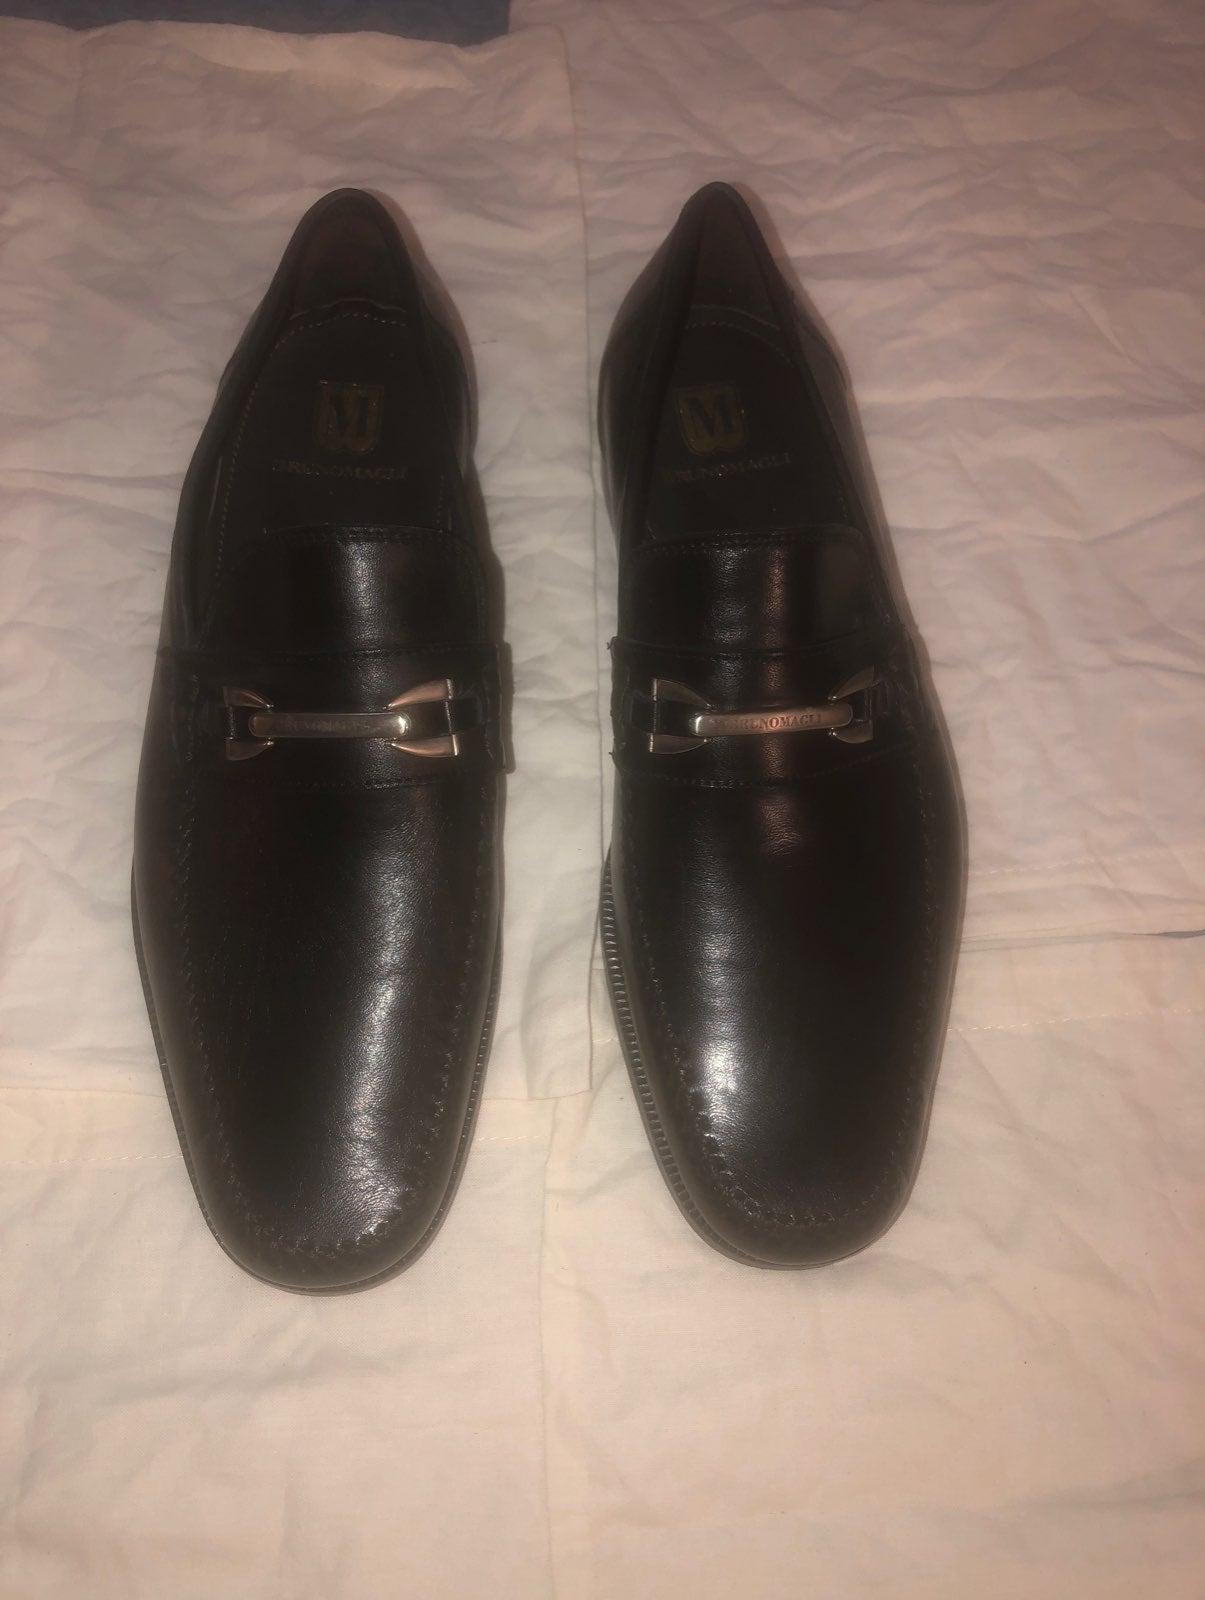 Brunomagli Loafers size 91/2